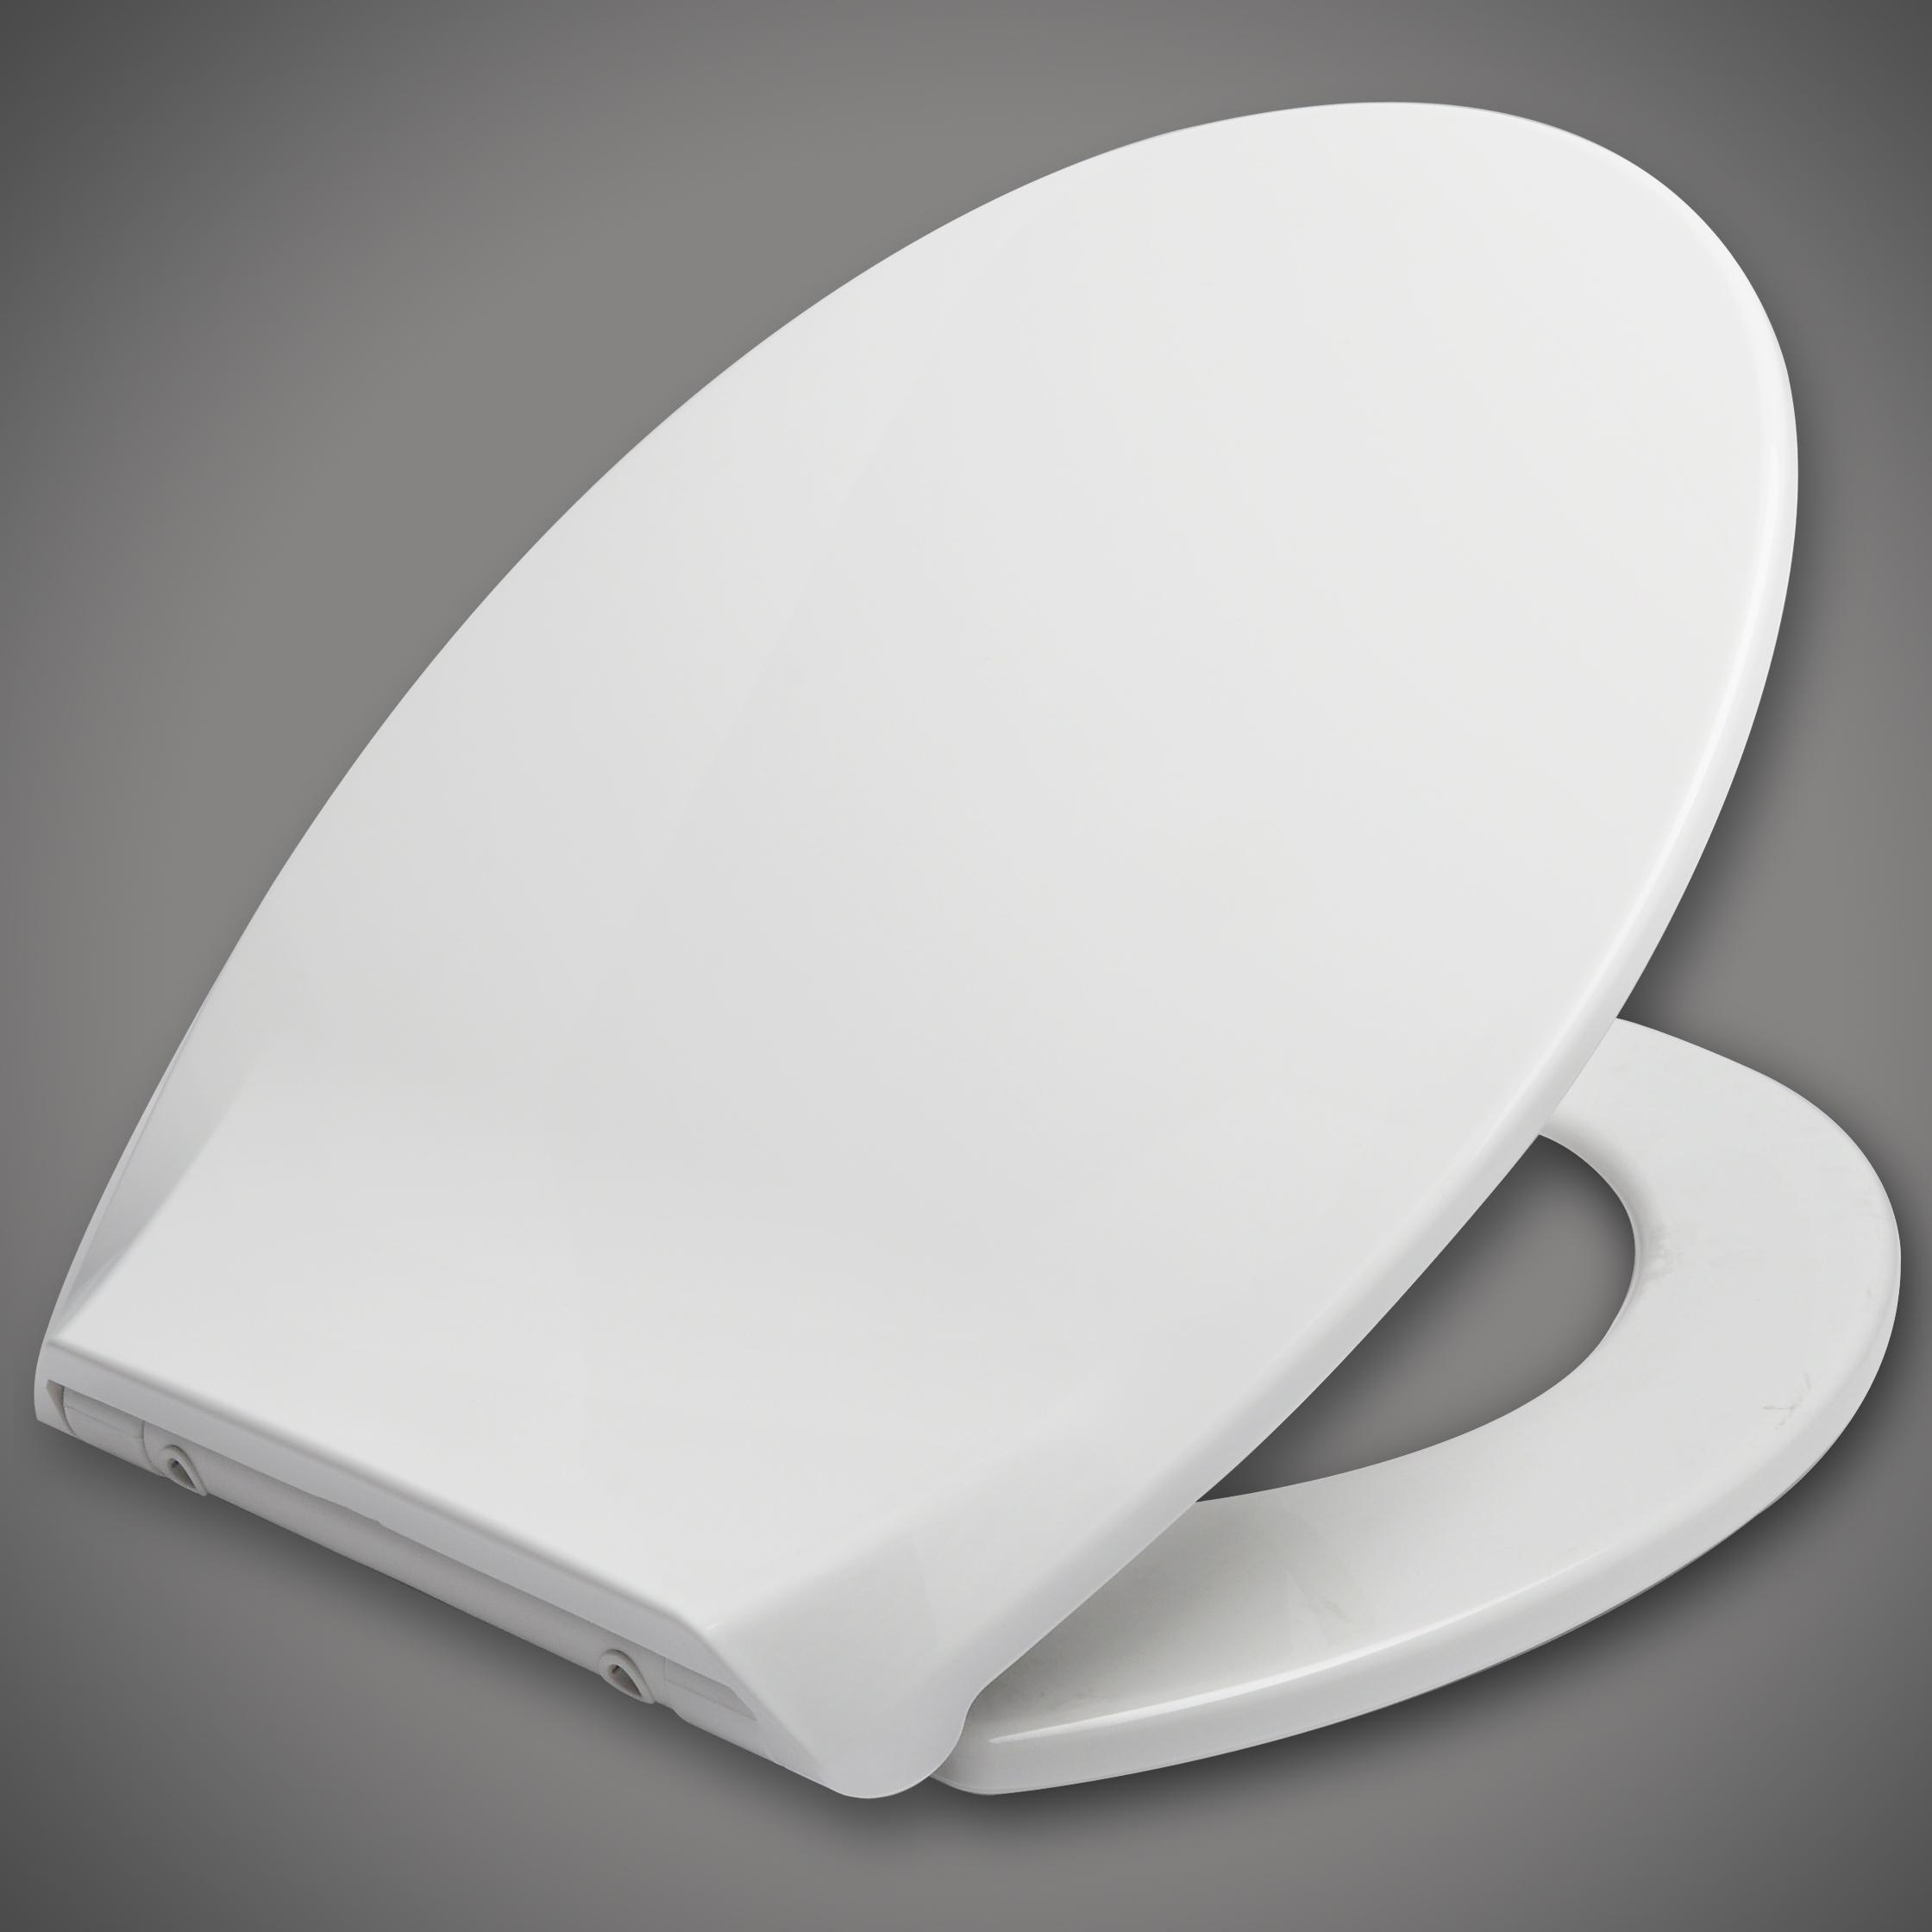 toilettensitz klodeckel wc sitz toilettendeckel mit absenkautomatik deckel e048 ebay. Black Bedroom Furniture Sets. Home Design Ideas